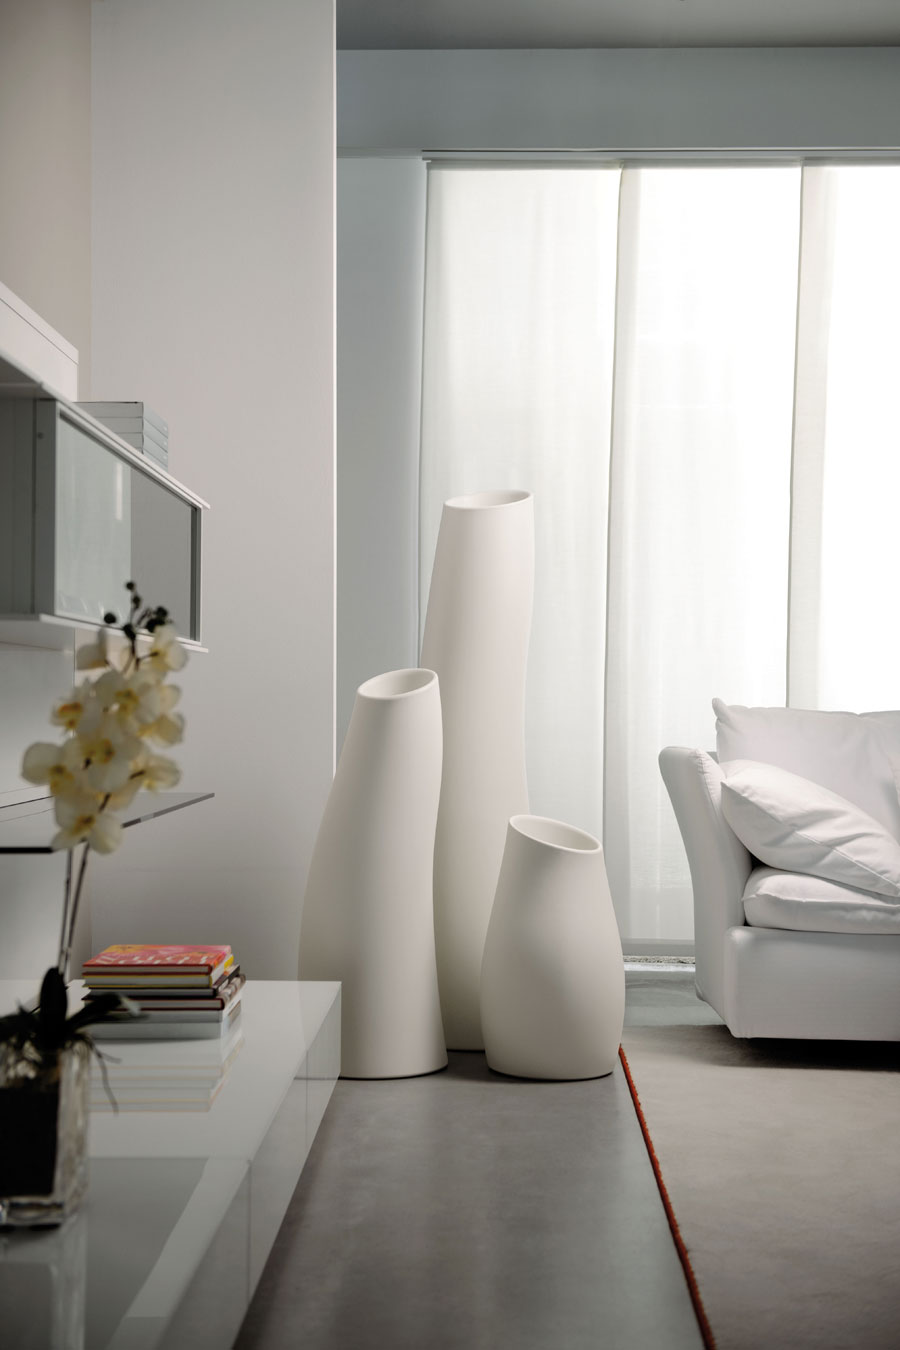 Vaso giardino design interno esterno moderno fioriera vasi for Portavasi da interno